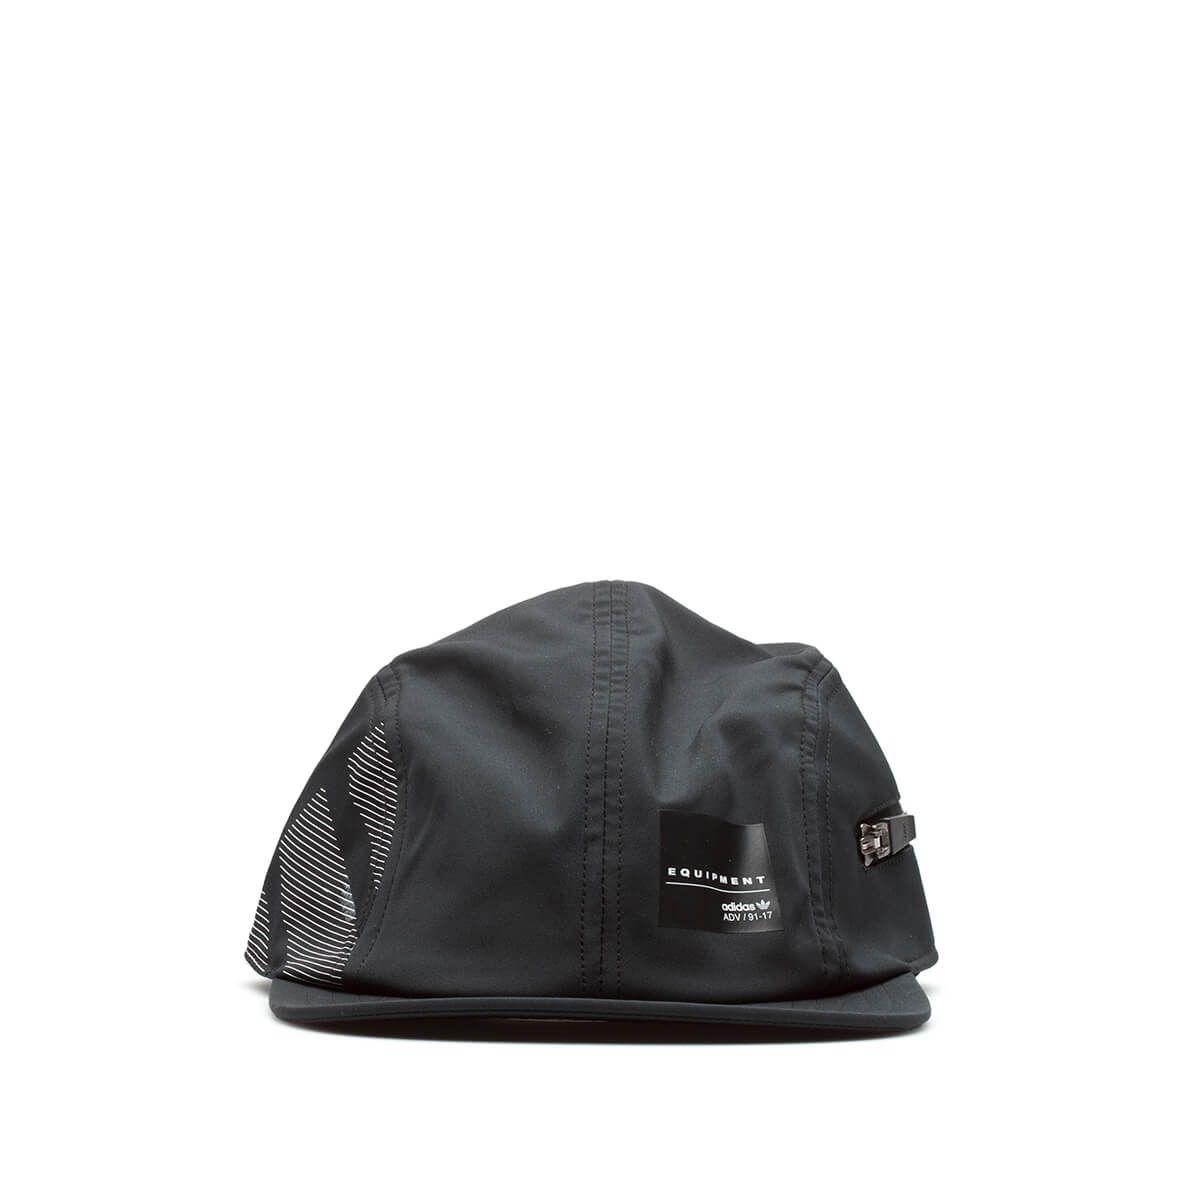 Adidas Originals Adidas Originals Eqt Zip Cap - Black - 9804692 ... 9c6acf3eae8